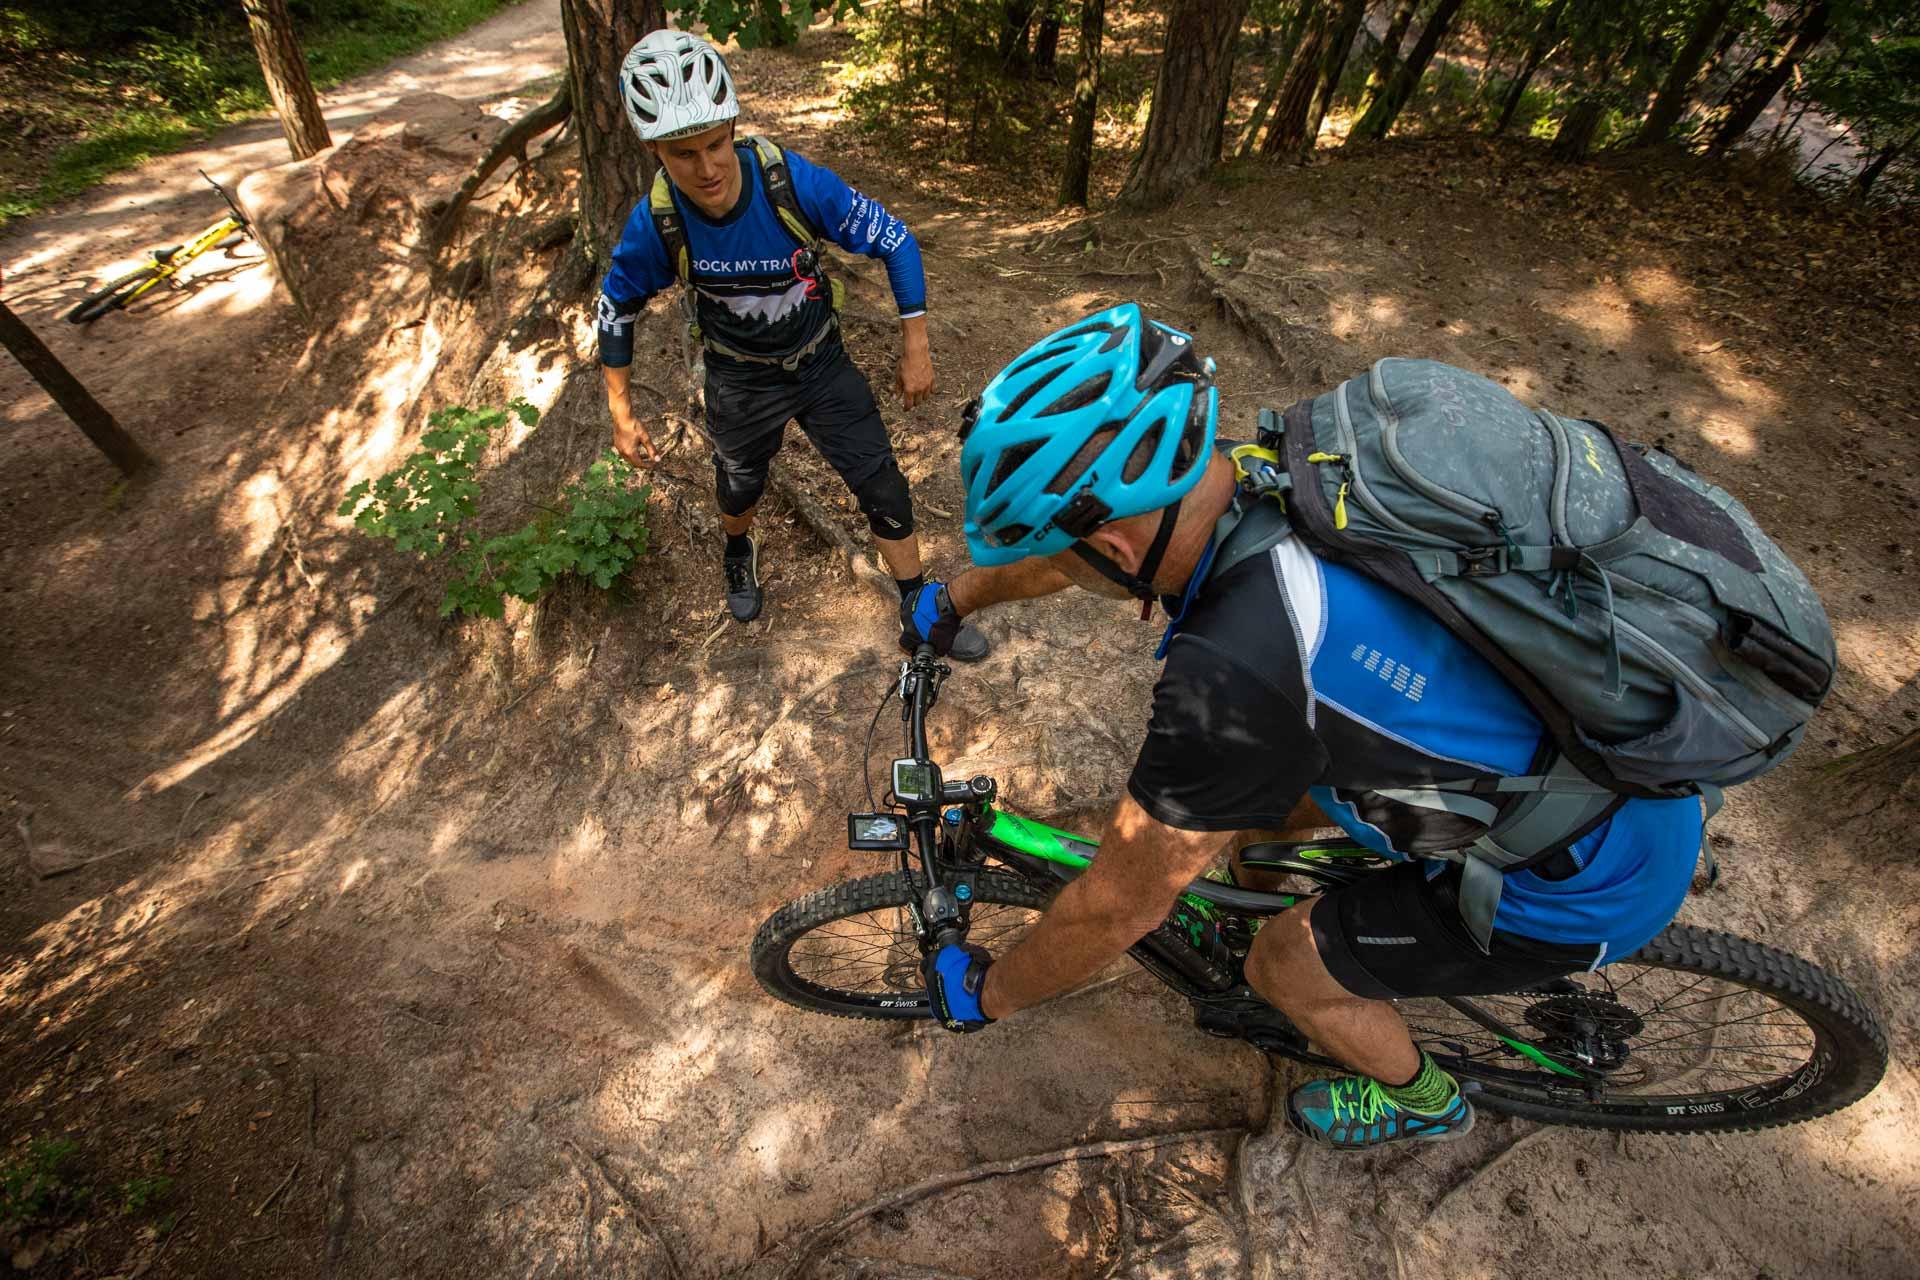 eMTB Fortgeschritten Fahrtechnik Kurs in Frankfurt | Taunus - Rock my Trail Bikeschule